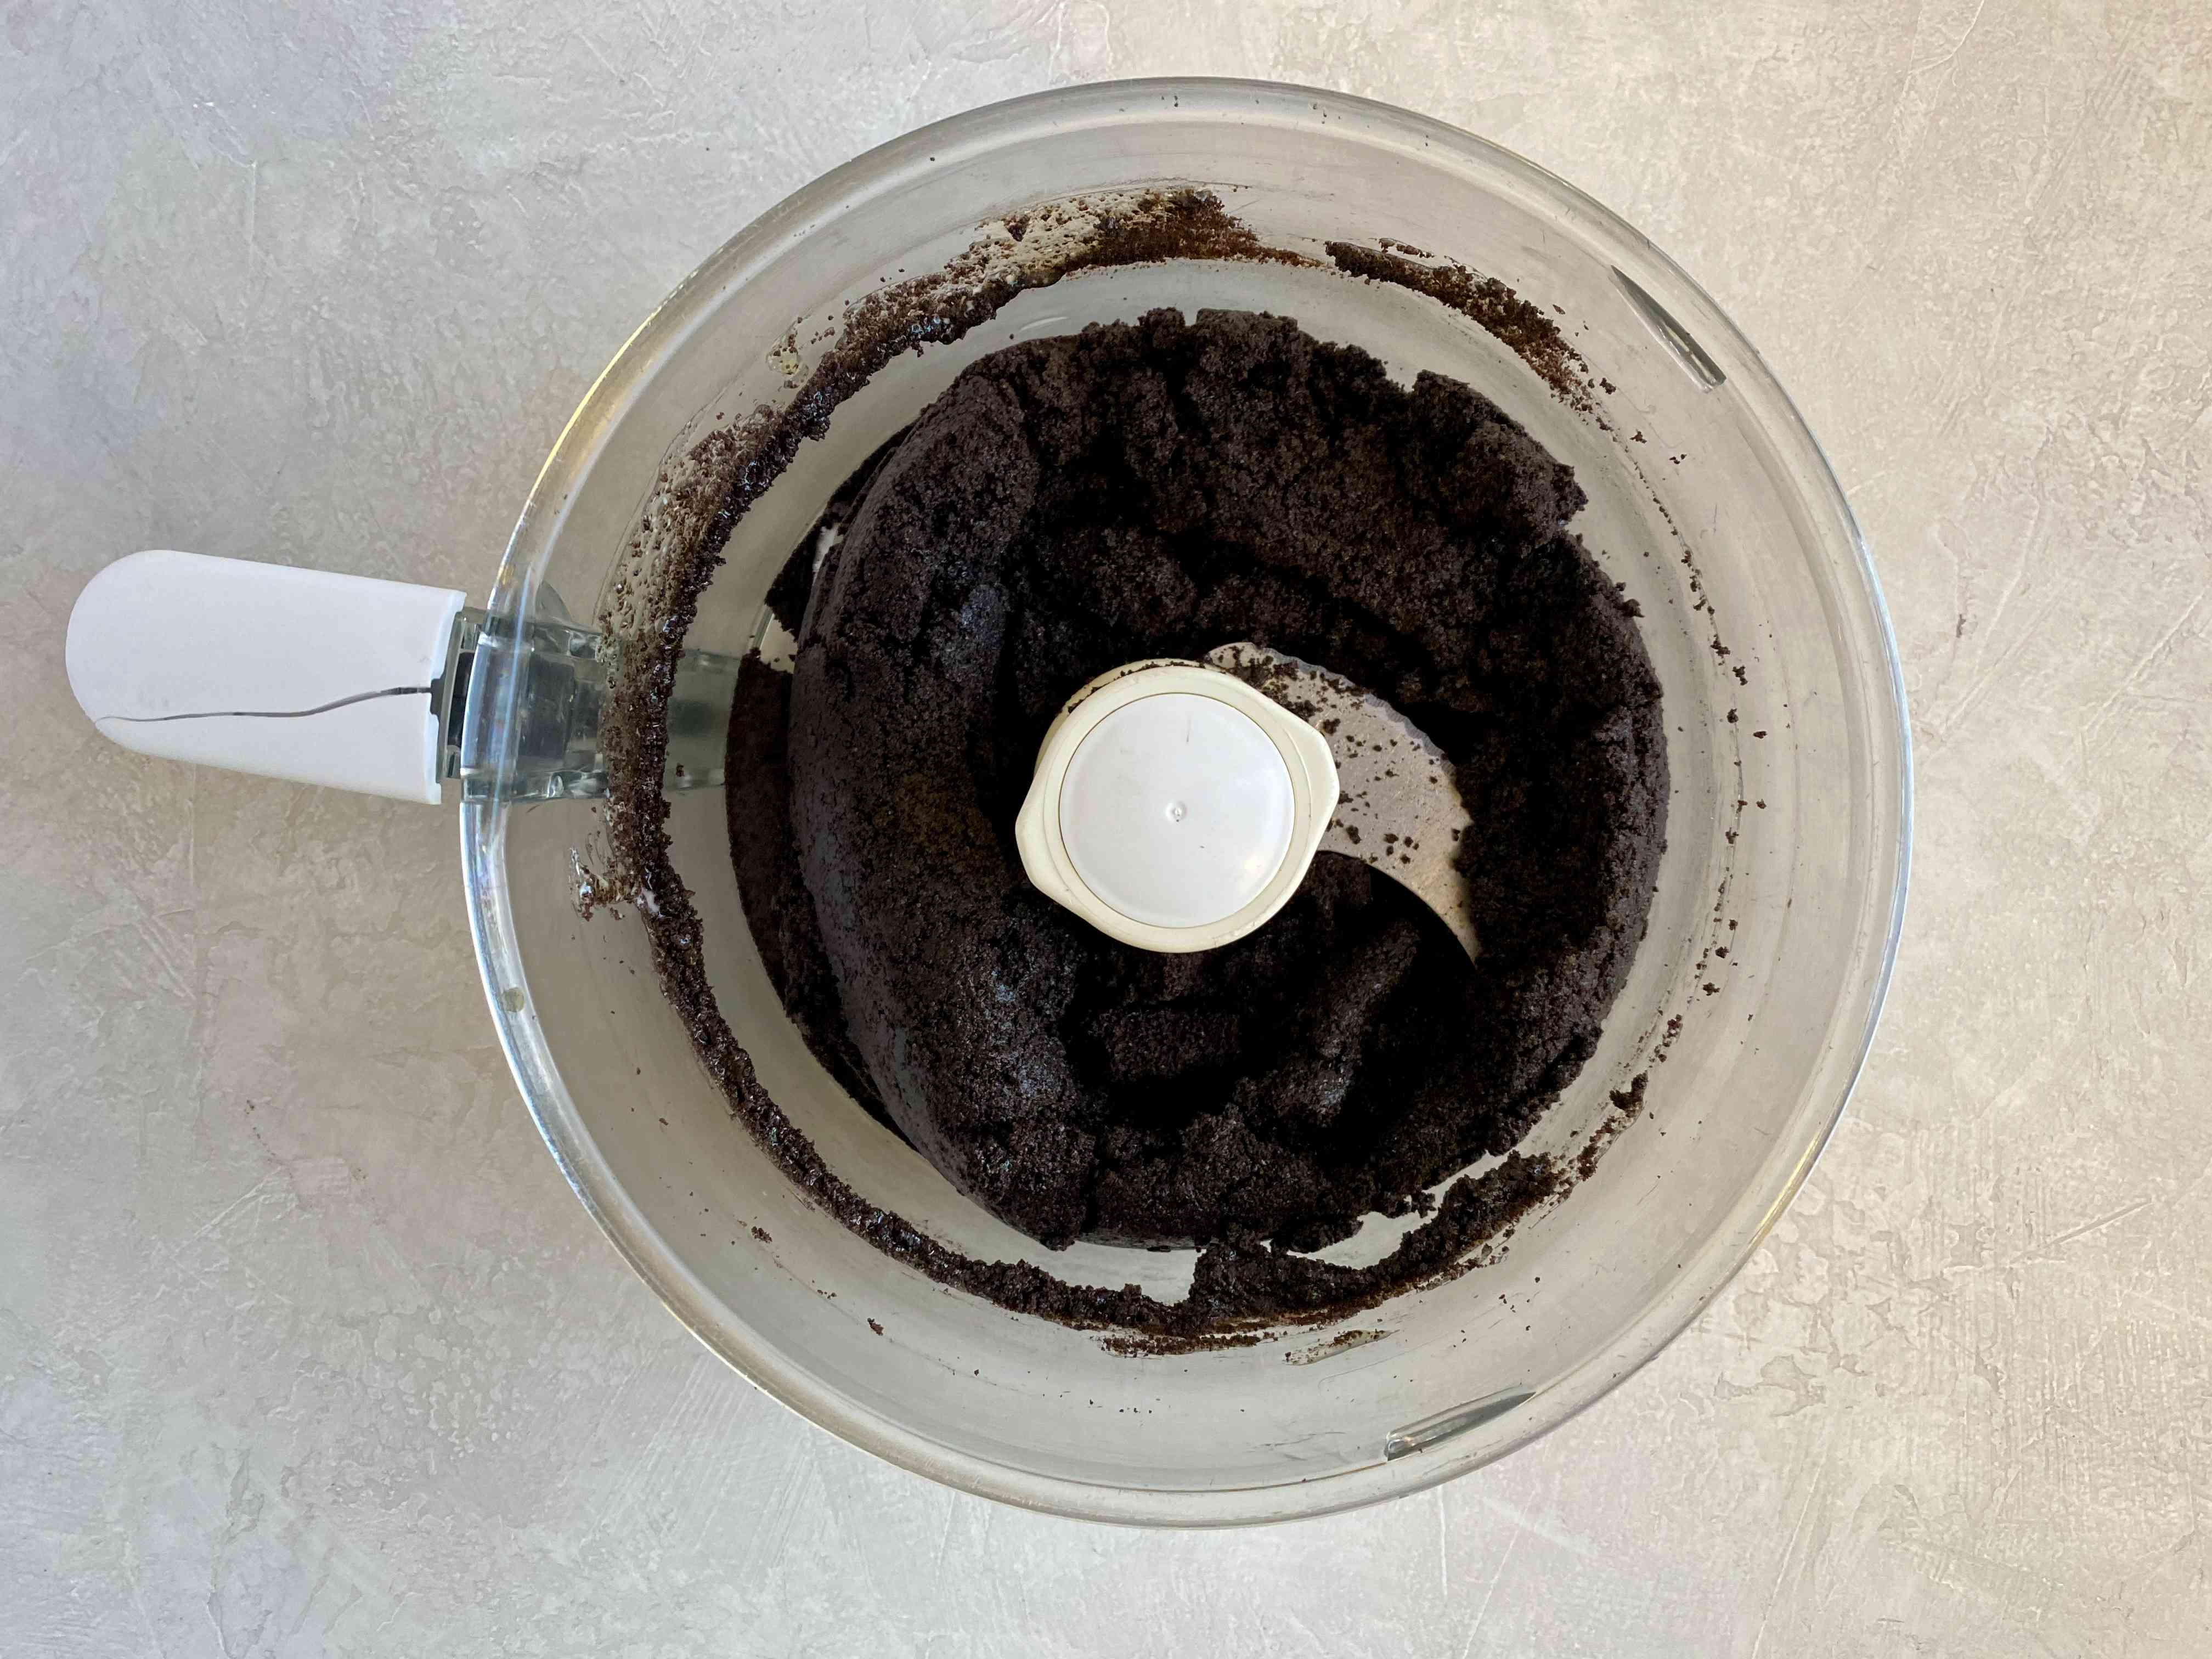 Oreo cookie crust in food processor